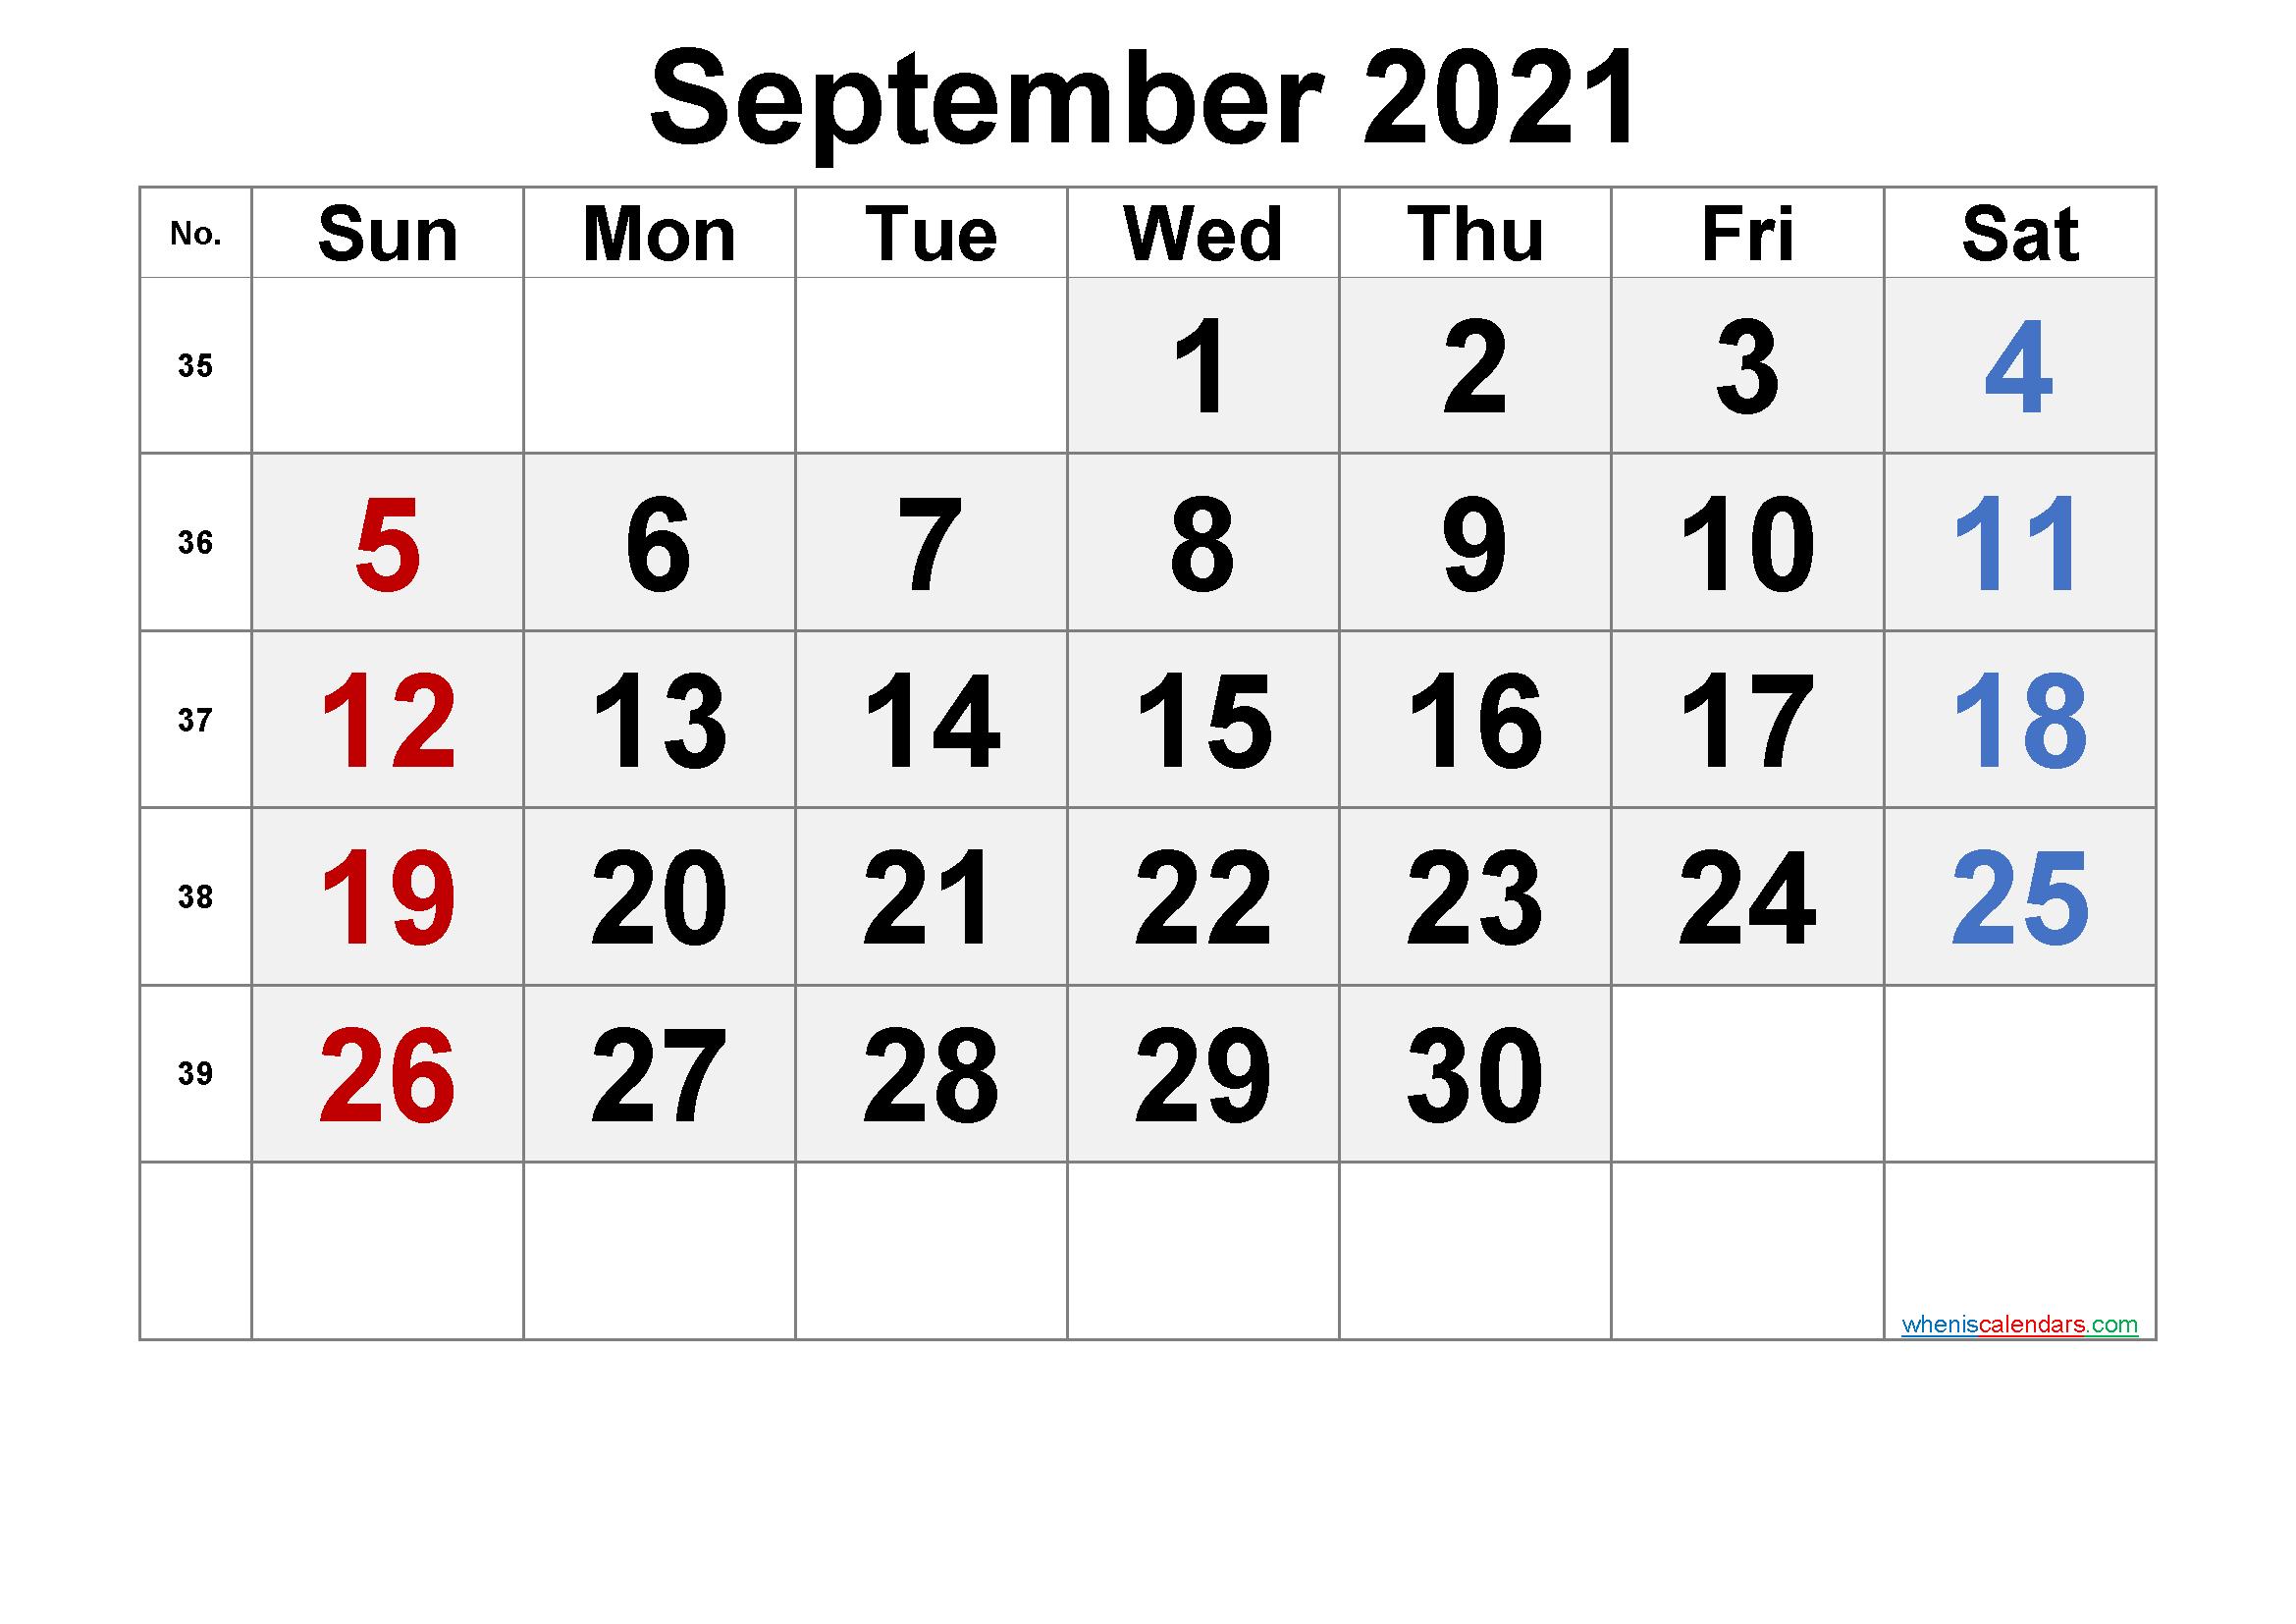 Printable Calendar September 2021  6 Templates   Free with regard to 3 Month Printable Calendar Templates 2021 Sept